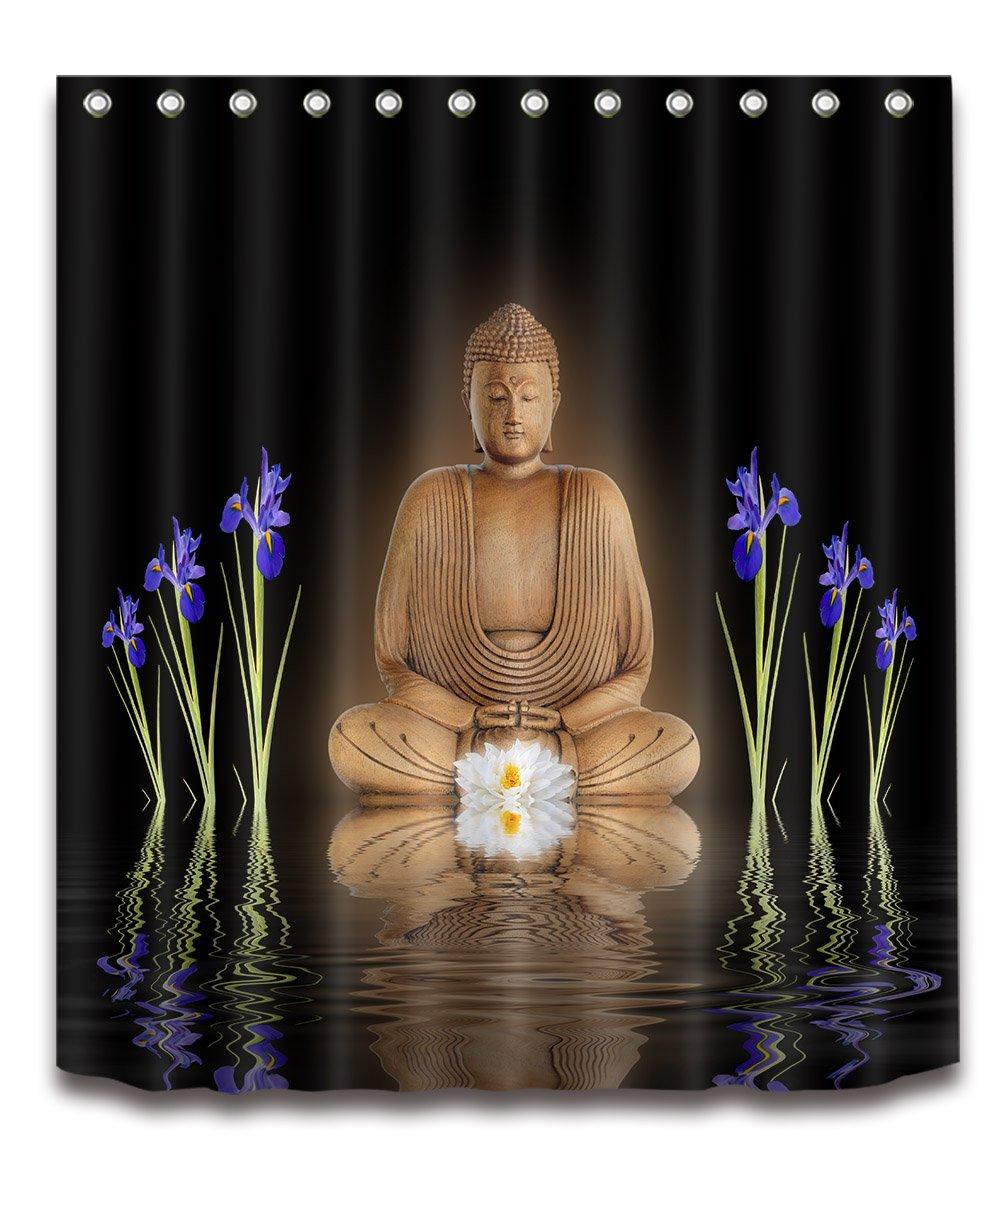 LB India Spa Zen Buddha Water Yoga Hot Spring Meditation Decoration Shower Curtain Polyester Fabric 3D 72x72 inch Mildew Resistant Waterproof Night Golden Light Datura Bathroom Bath Curtains